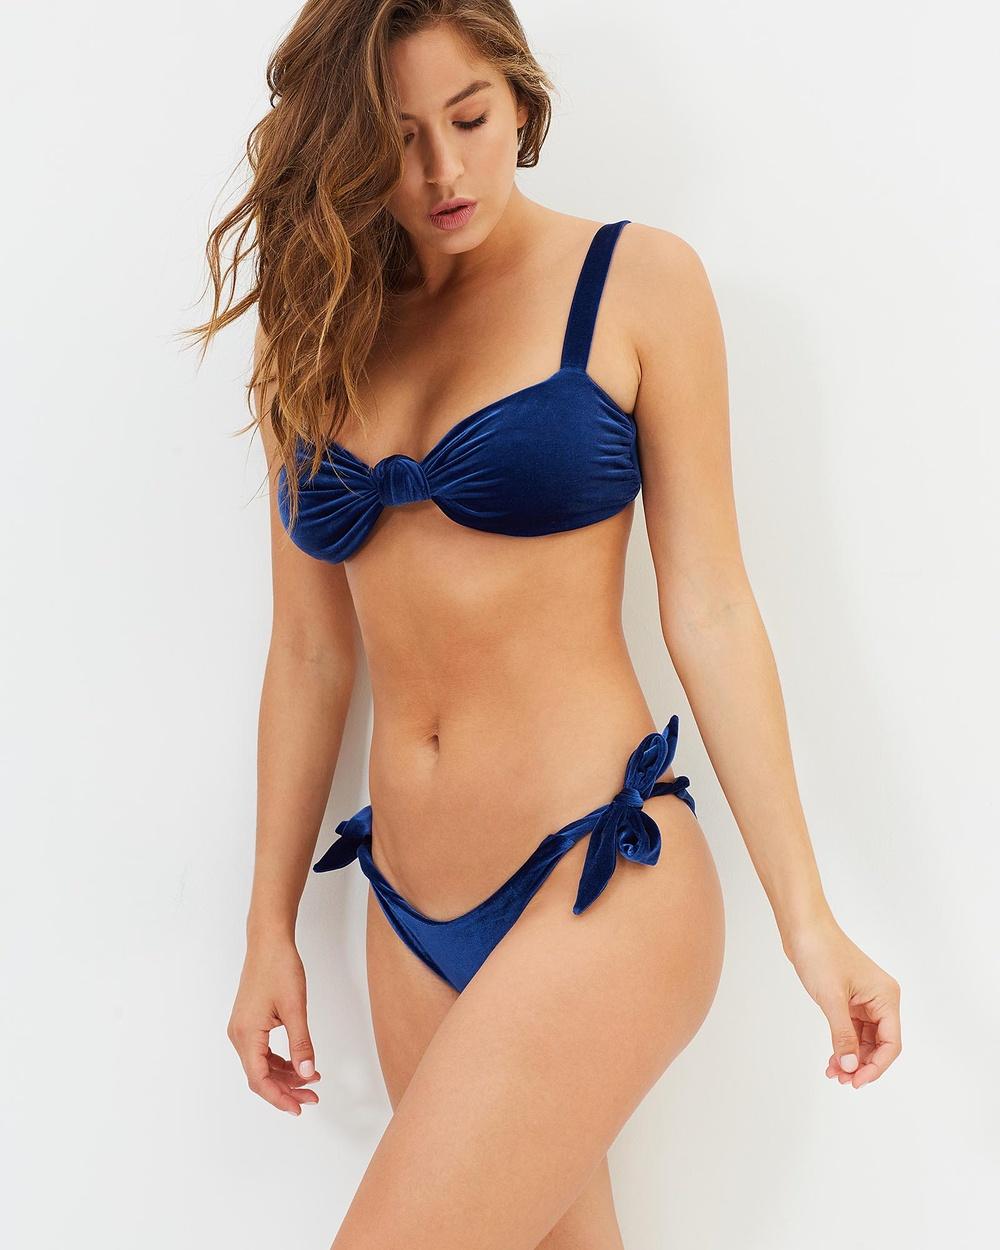 We The Dreamrs Ravello Bikini Bottoms Bikini Set Blue Ravello Bikini Bottoms